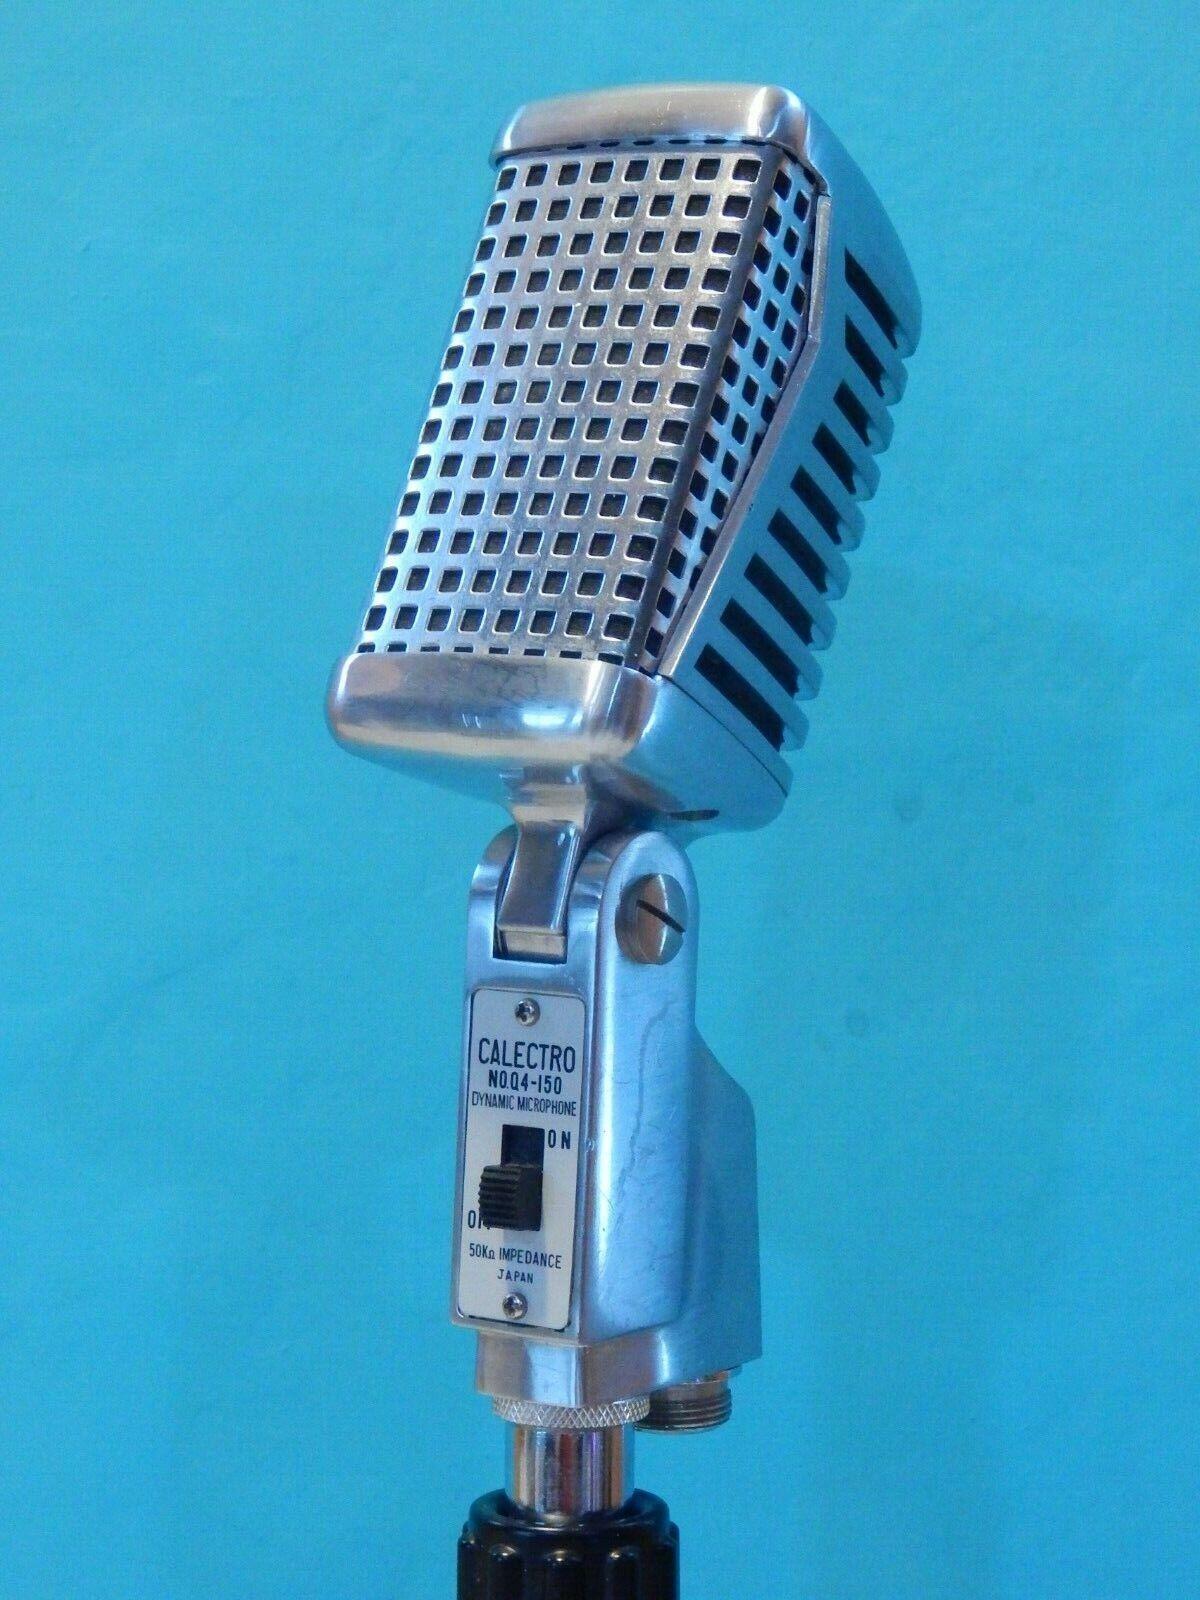 Vintage 1960S Calectro Q4-150 Microphone & Desk Stand Antique Deco Shure Prop